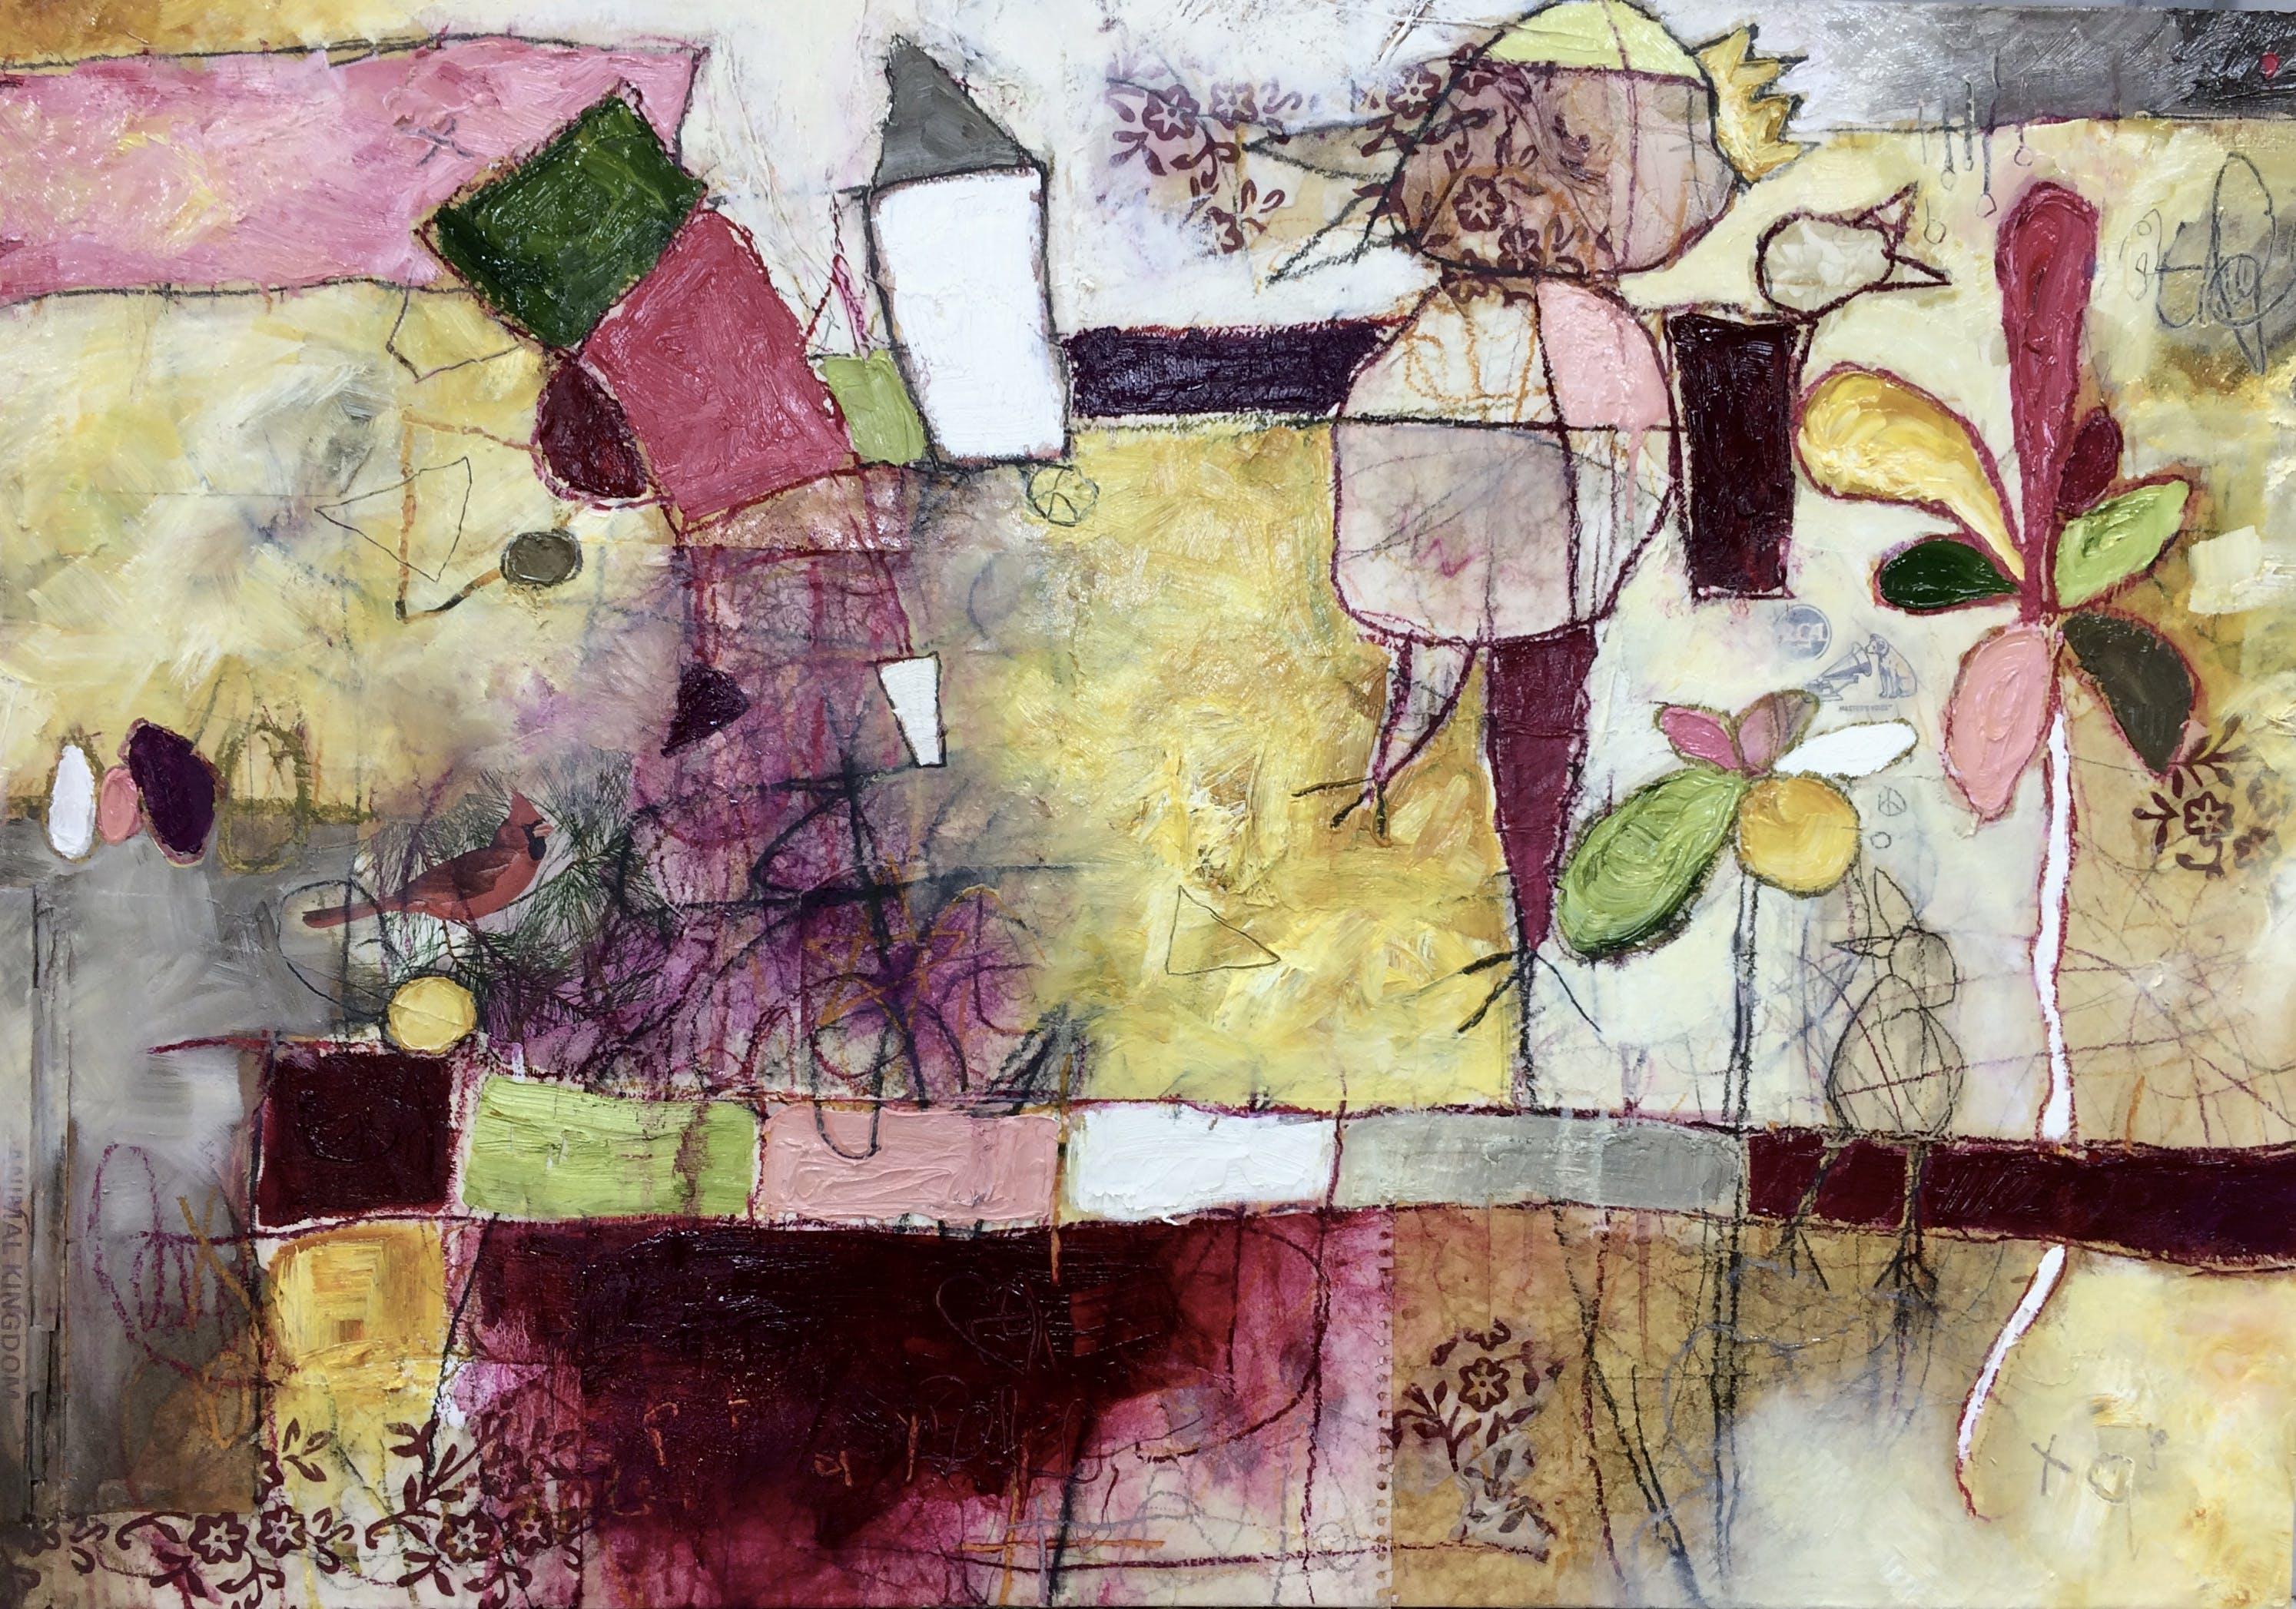 Painting by Caroline James